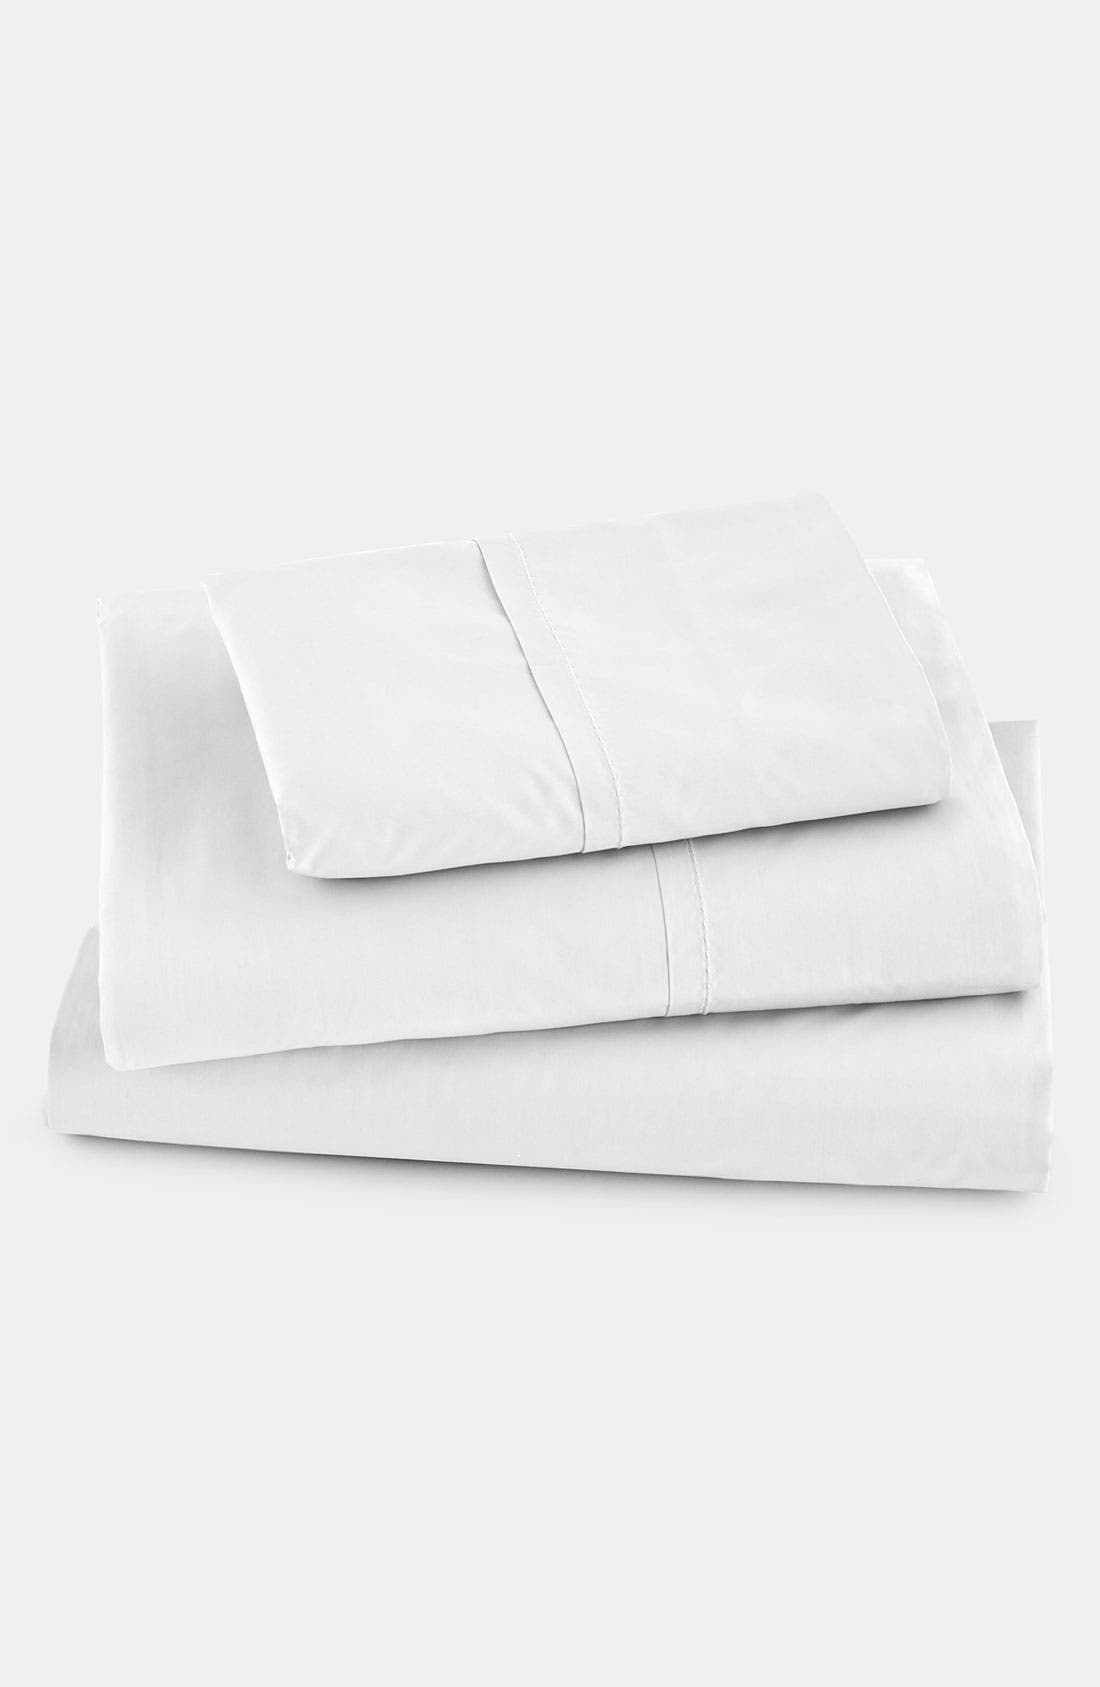 Donna Karan 'The Essential' 410 Thread Count Flat Sheet,                         Main,                         color, 100